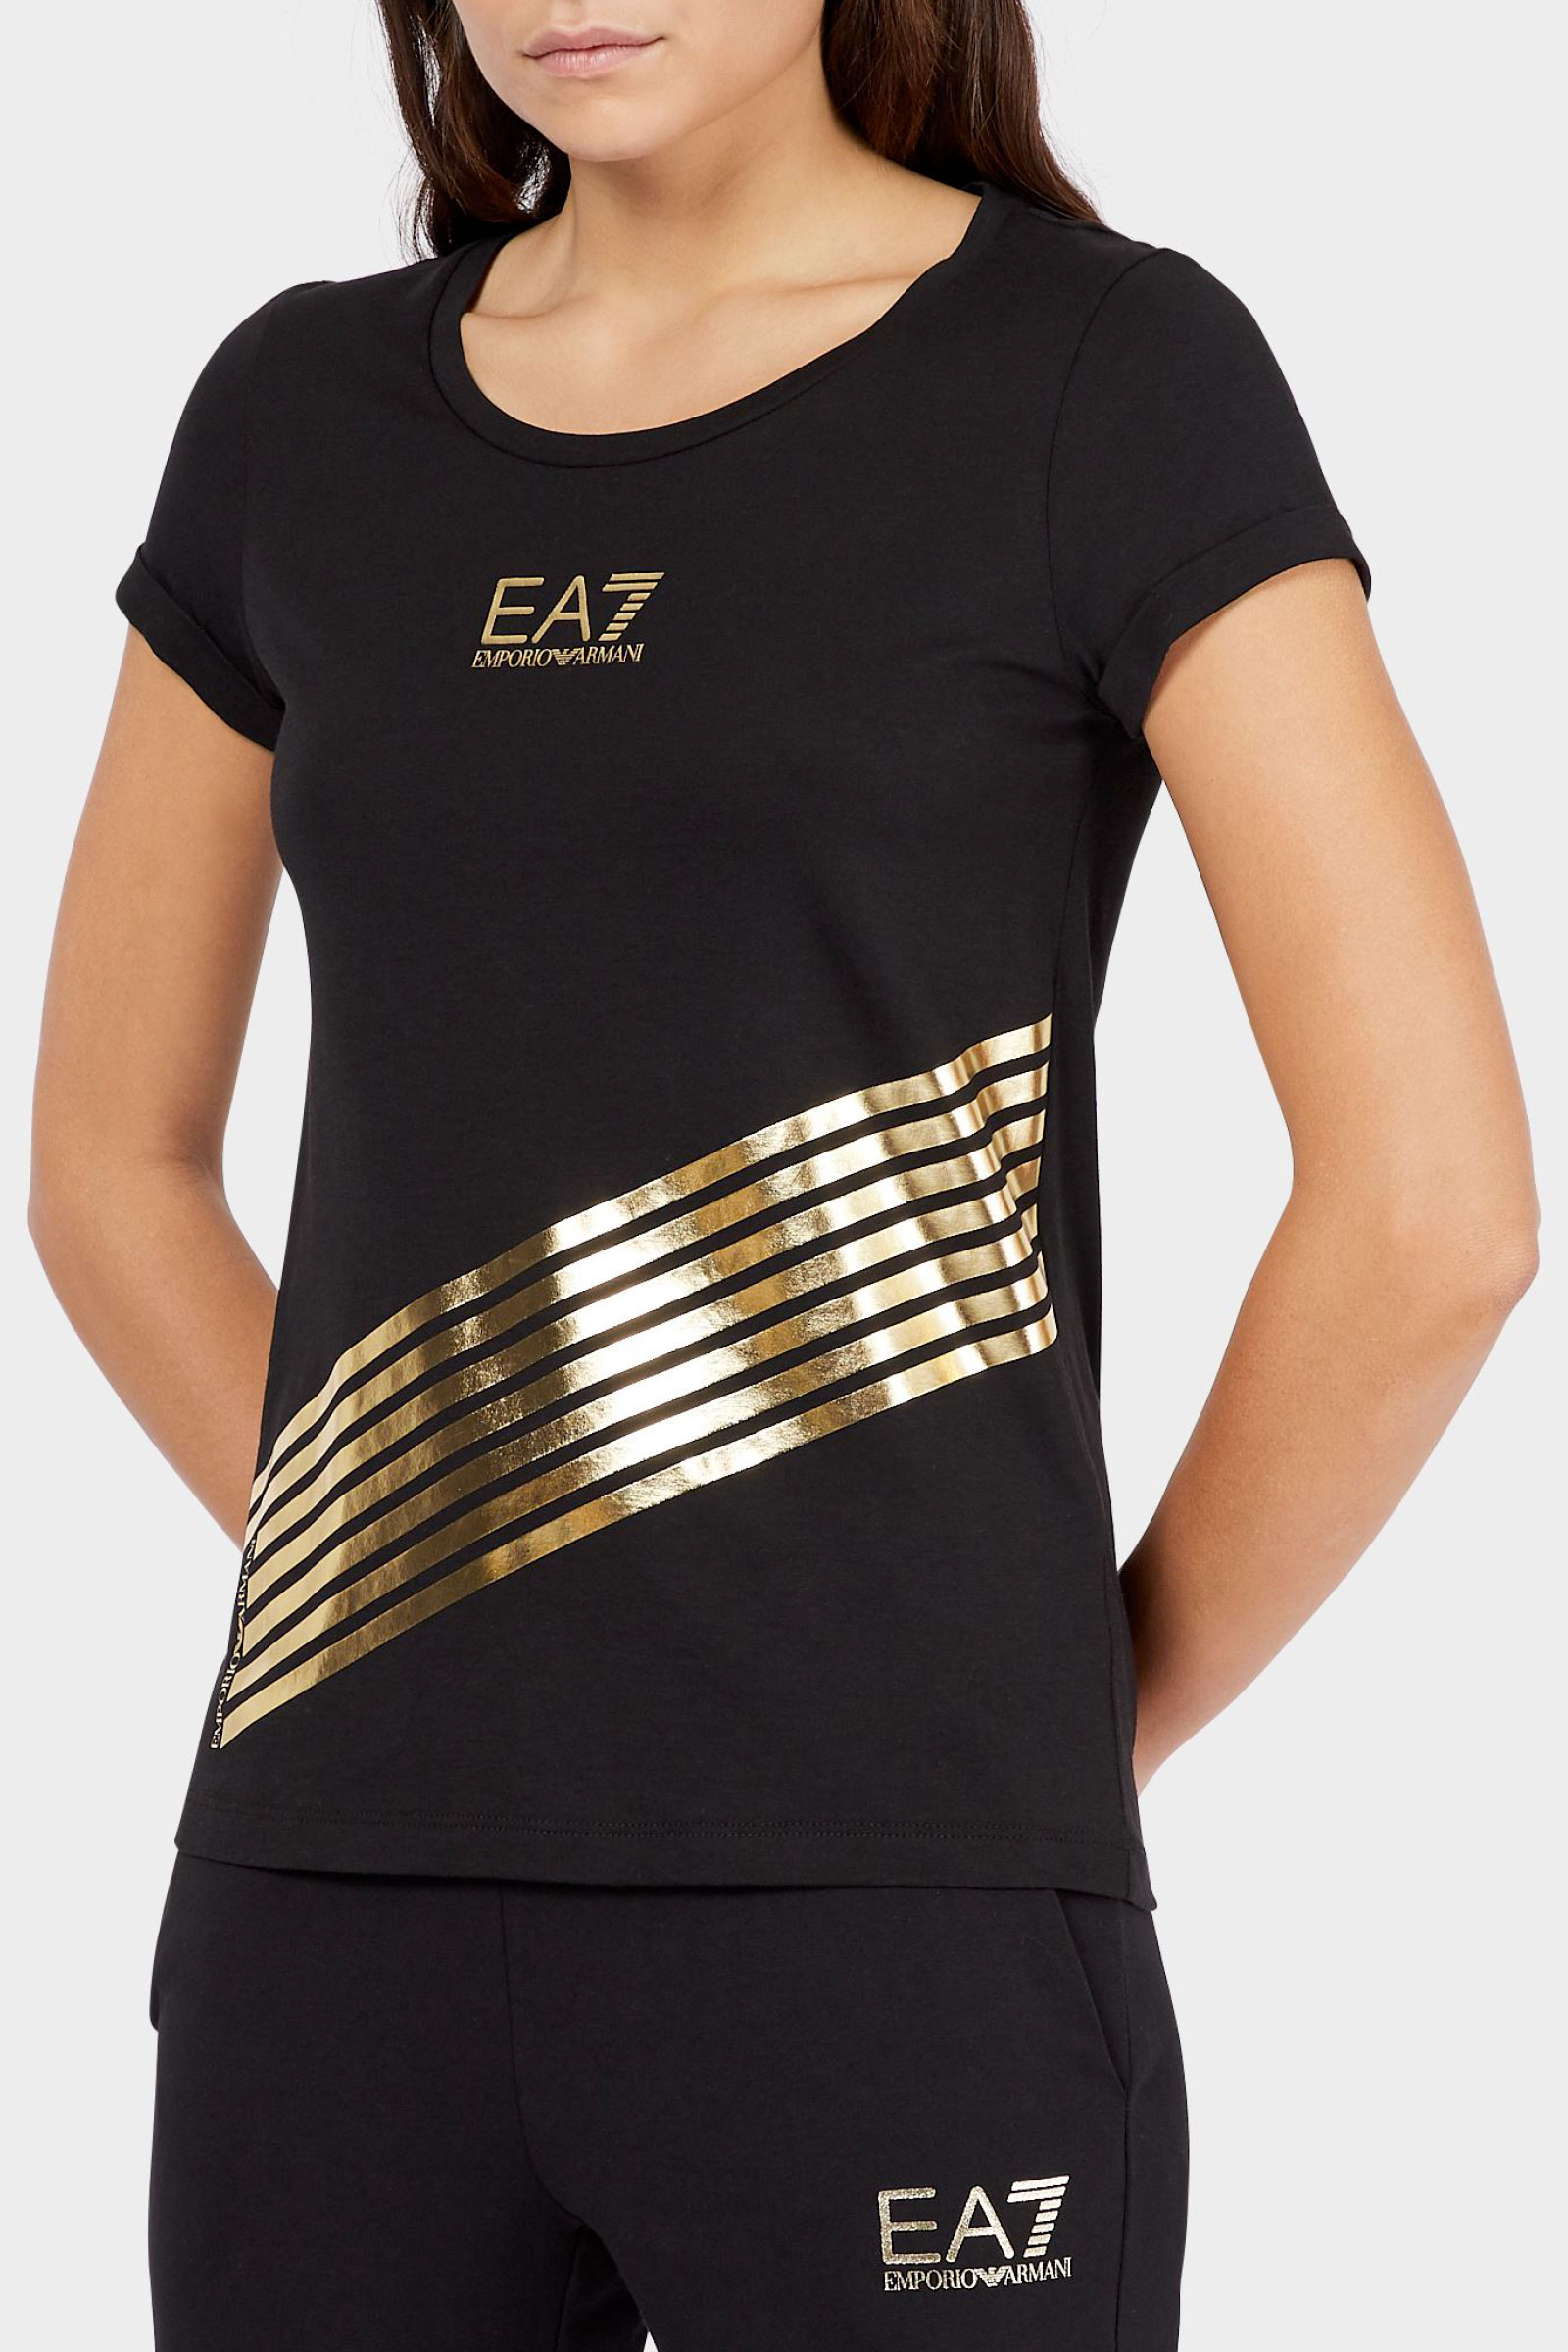 ARMANI EA7 Women's T-Shirt ARMANI EA7 | T-Shirt | 3KTT42 TJ52Z1200